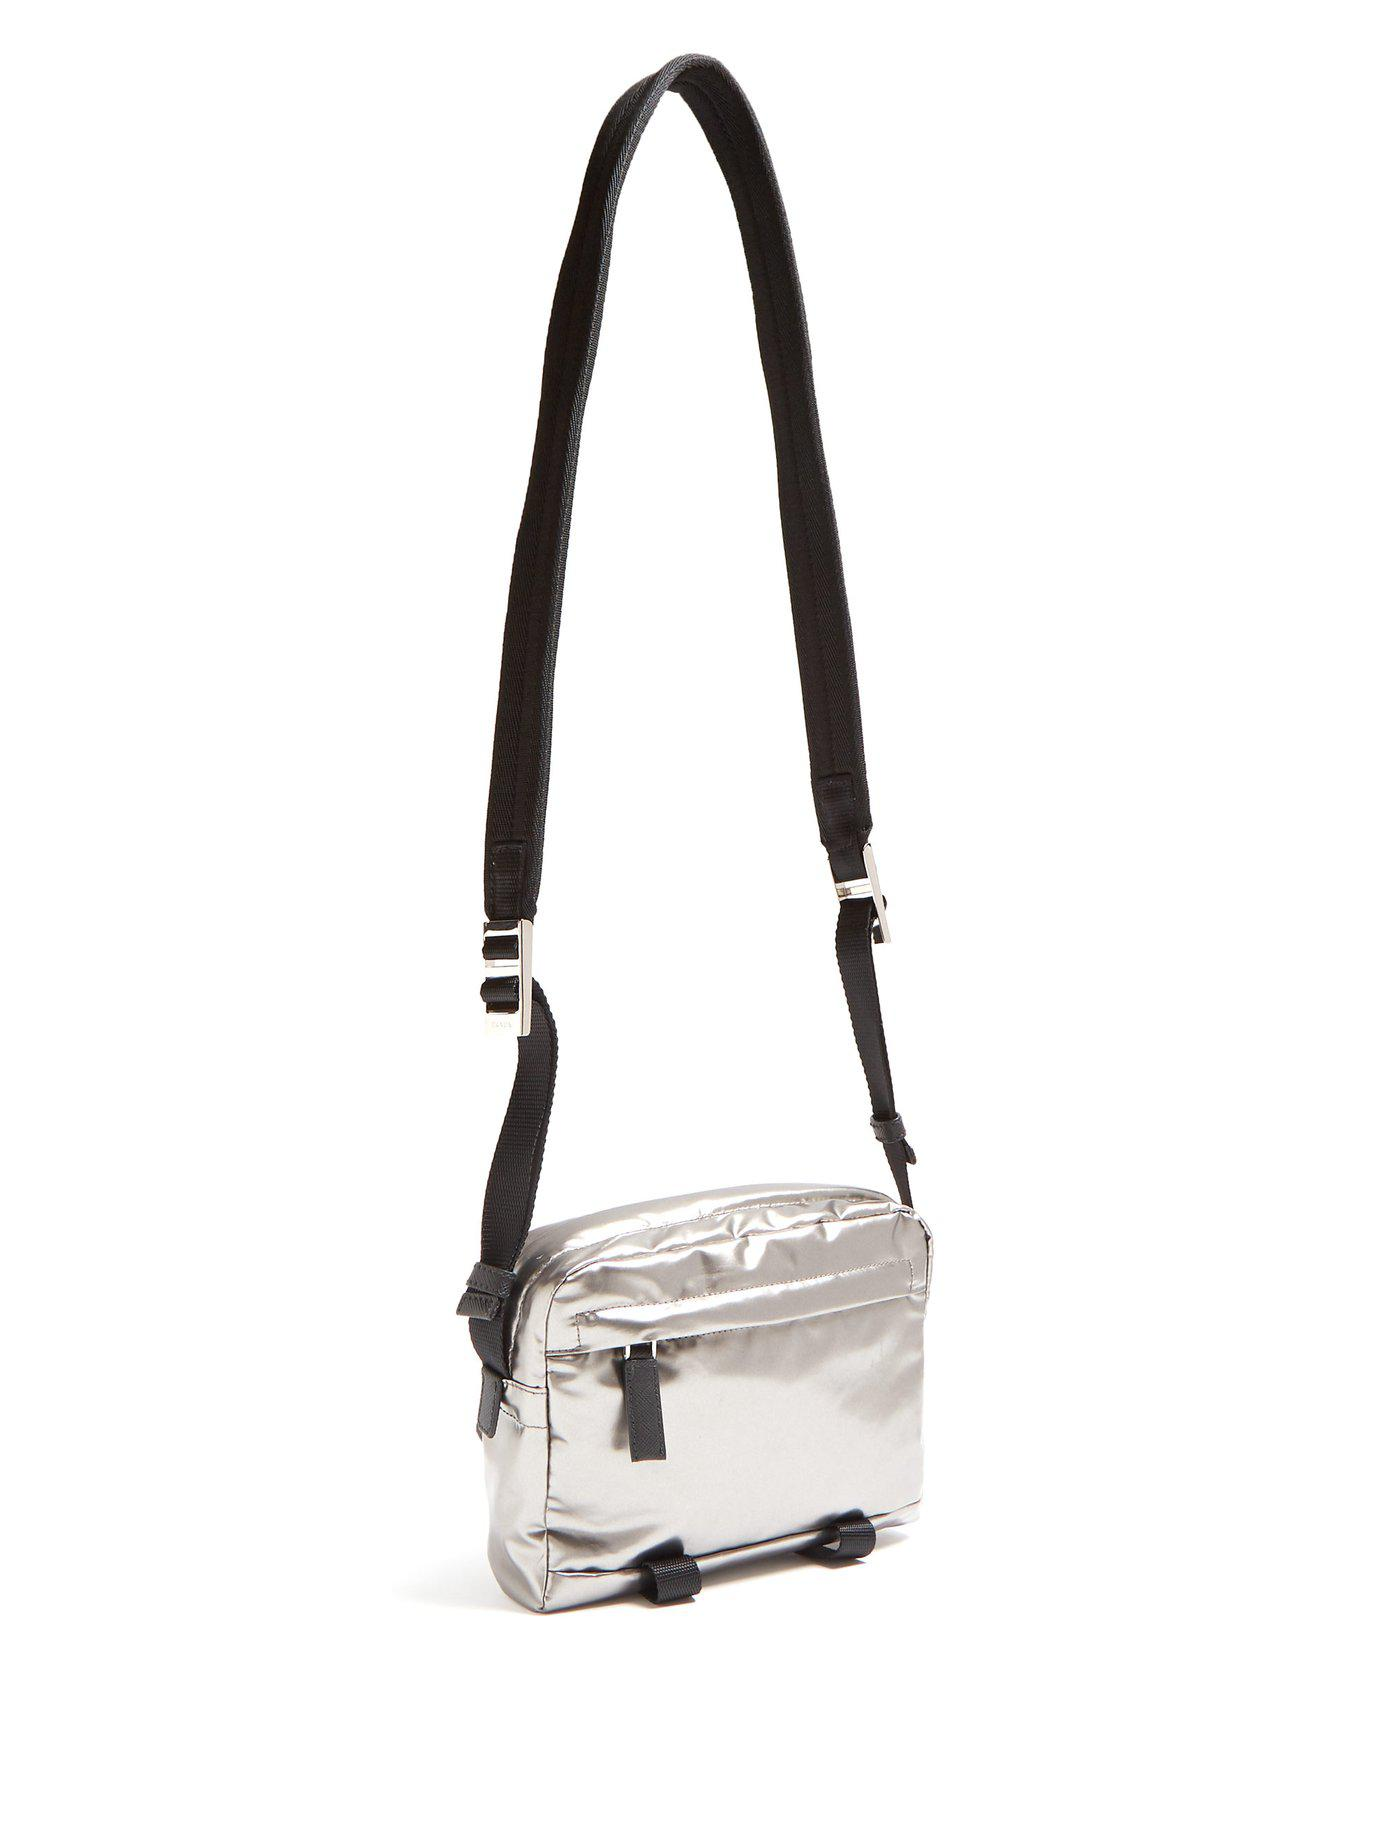 9cde2826f537f1 Prada Metallic Nylon Cross Body Bag in Metallic for Men - Lyst